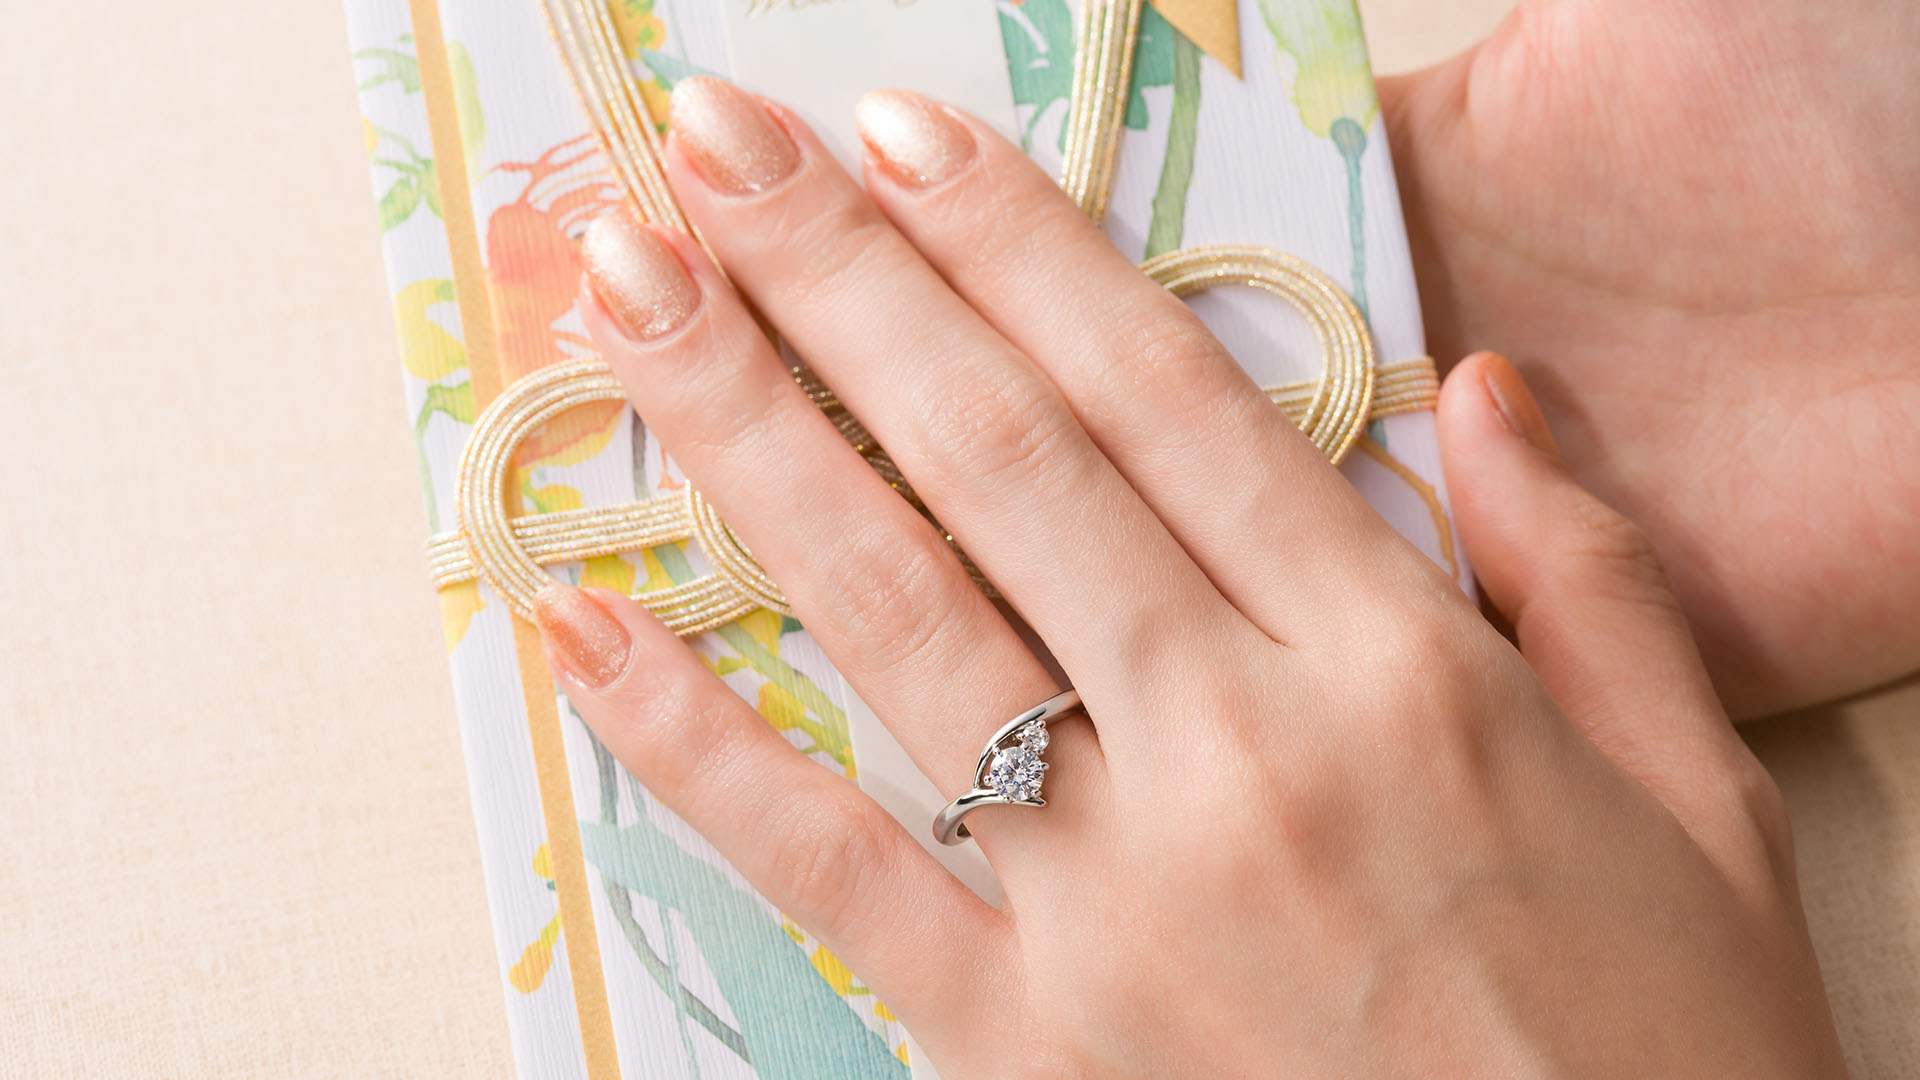 lesart レサート | 婚約指輪サムネイル 3